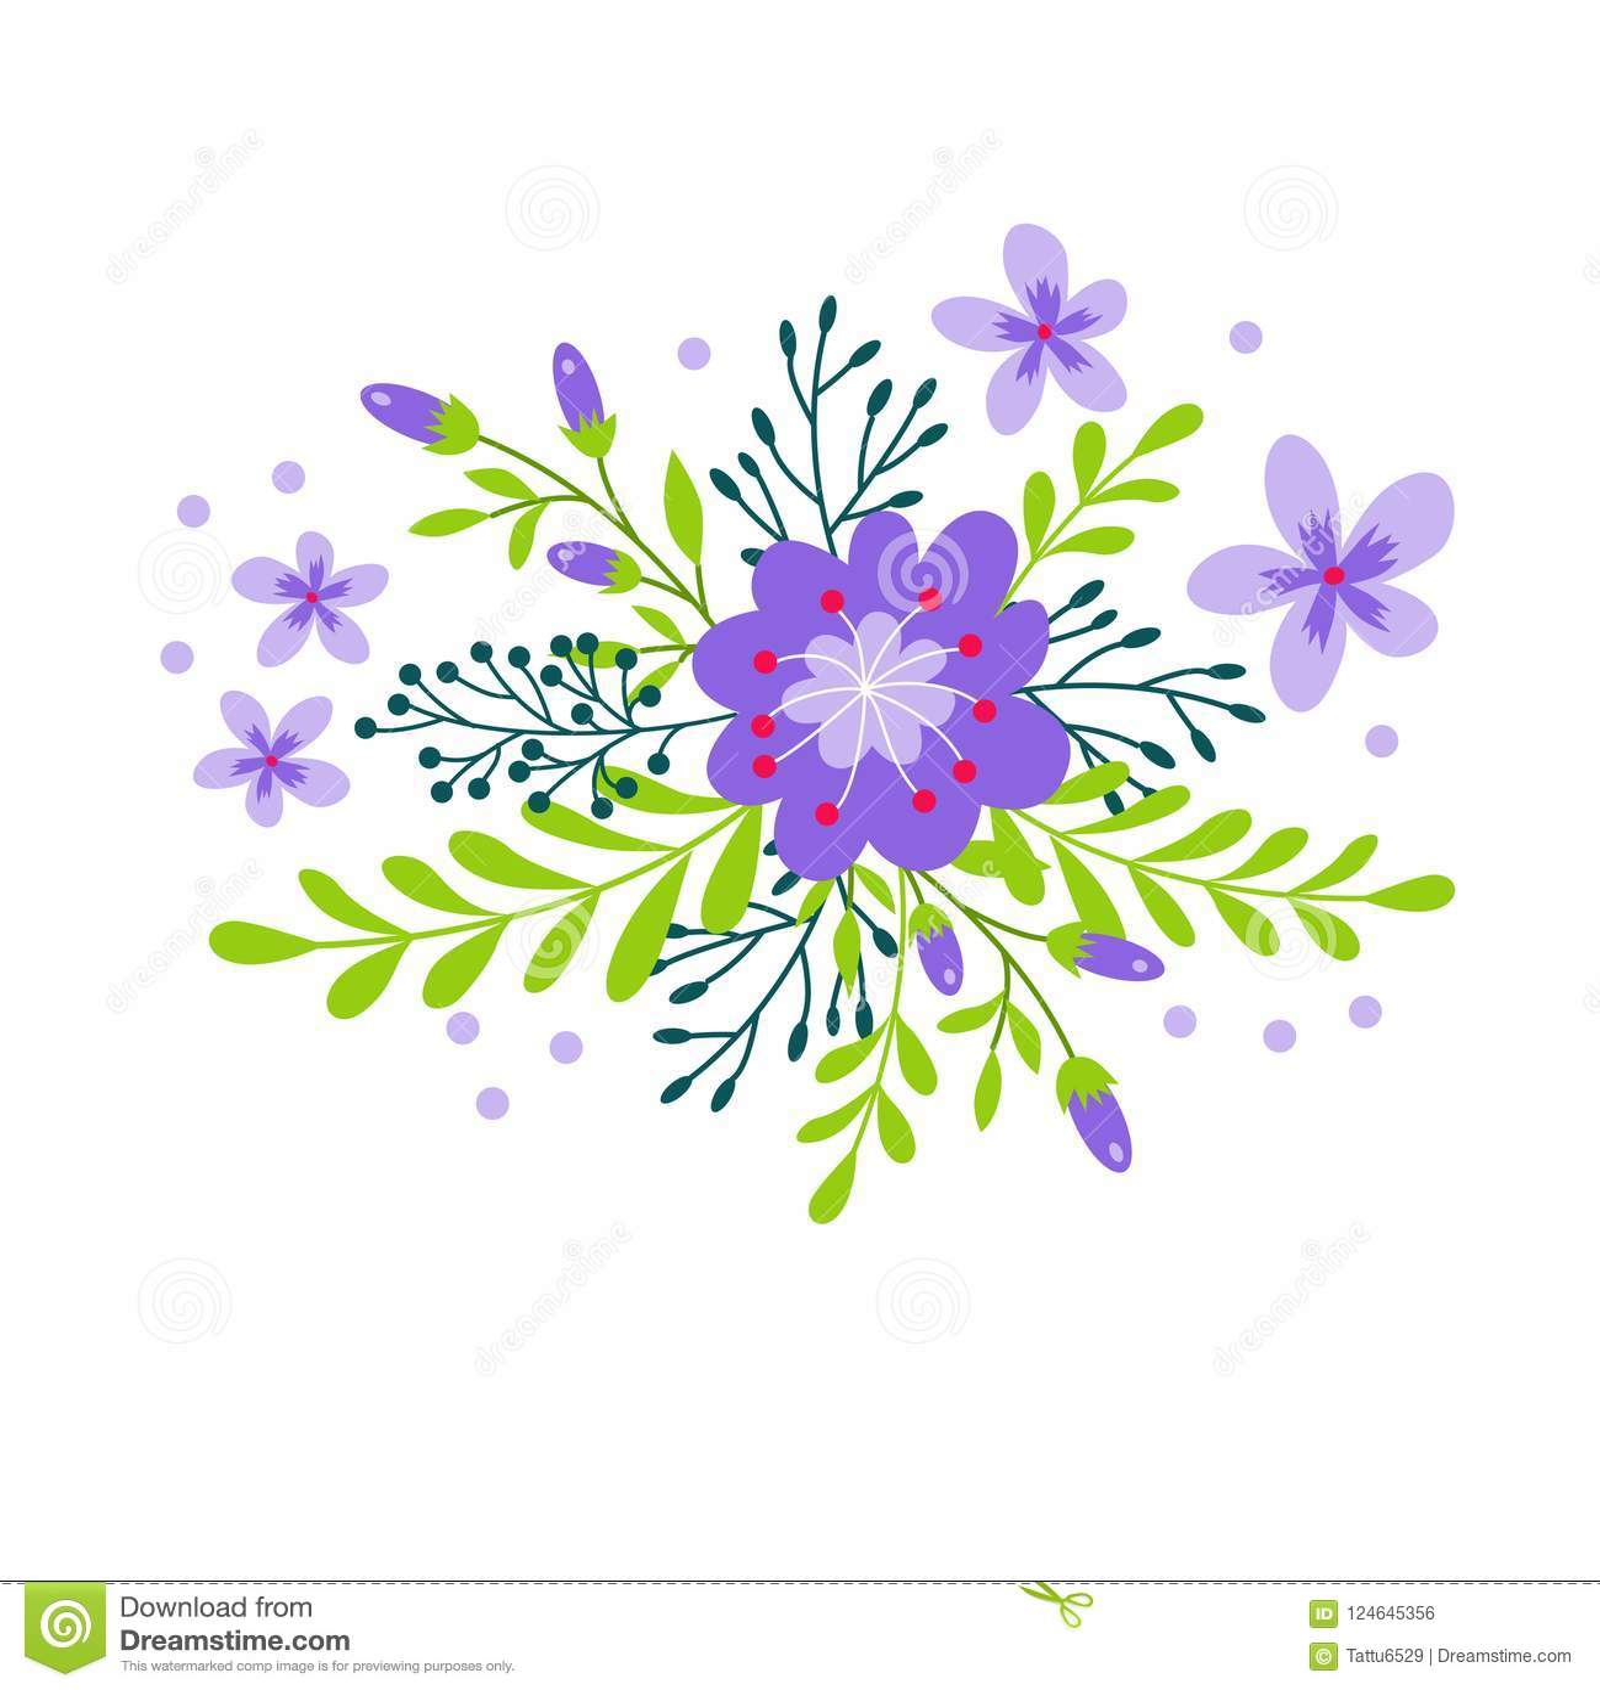 Cute bouquet of decorative flower stock illustration illustration download cute bouquet of decorative flower stock illustration illustration of leave background 124645356 izmirmasajfo